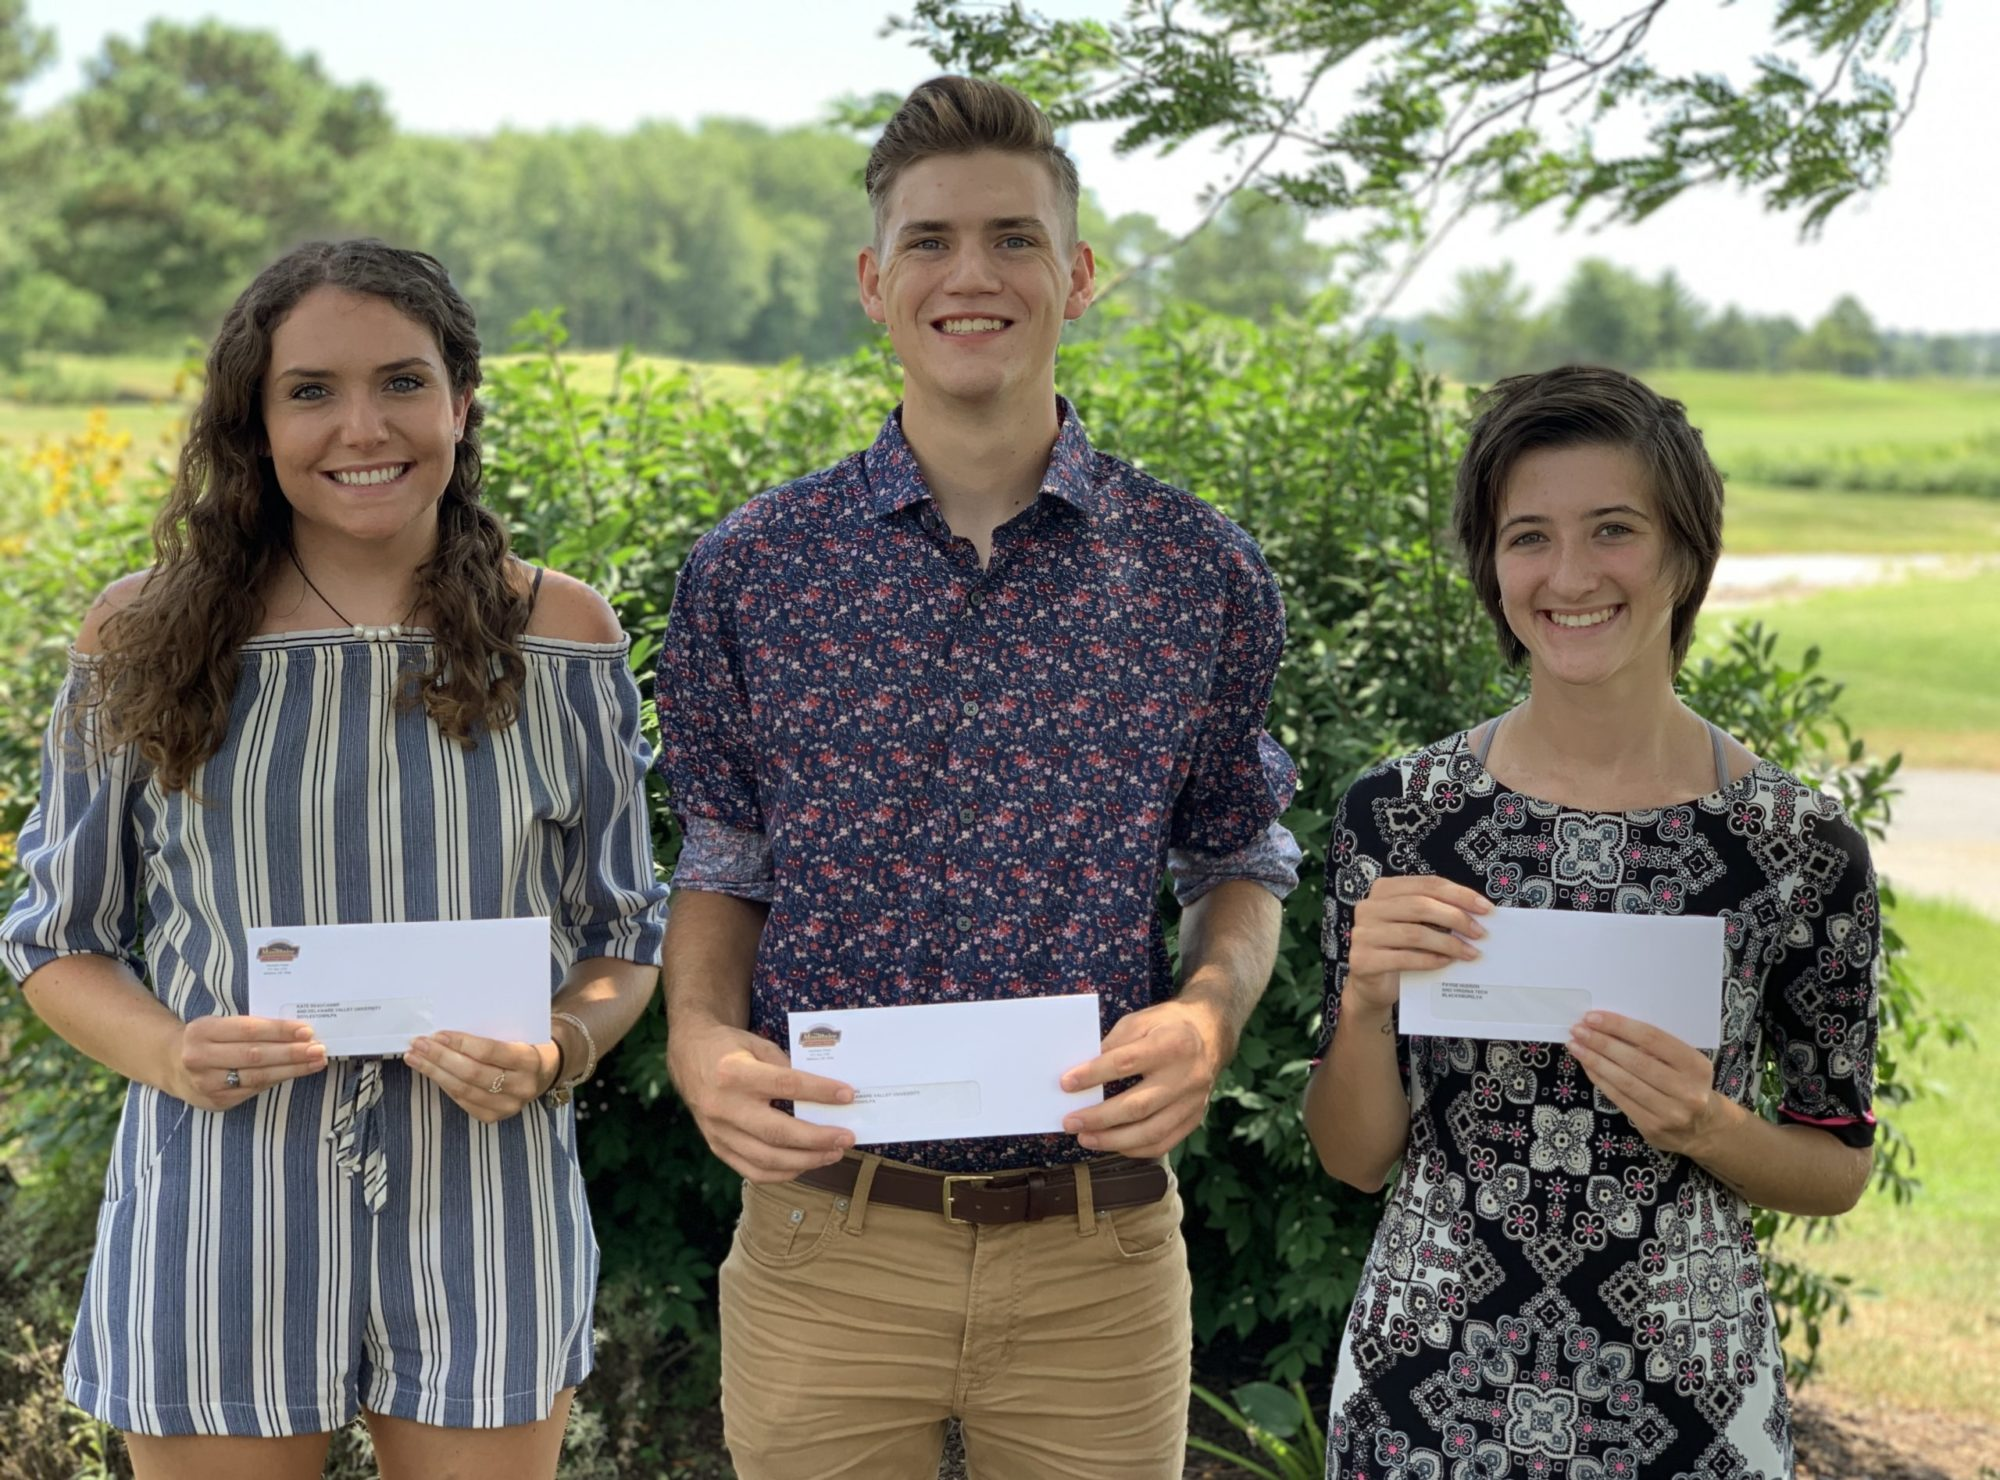 Annual Mountaire Scholarship Program